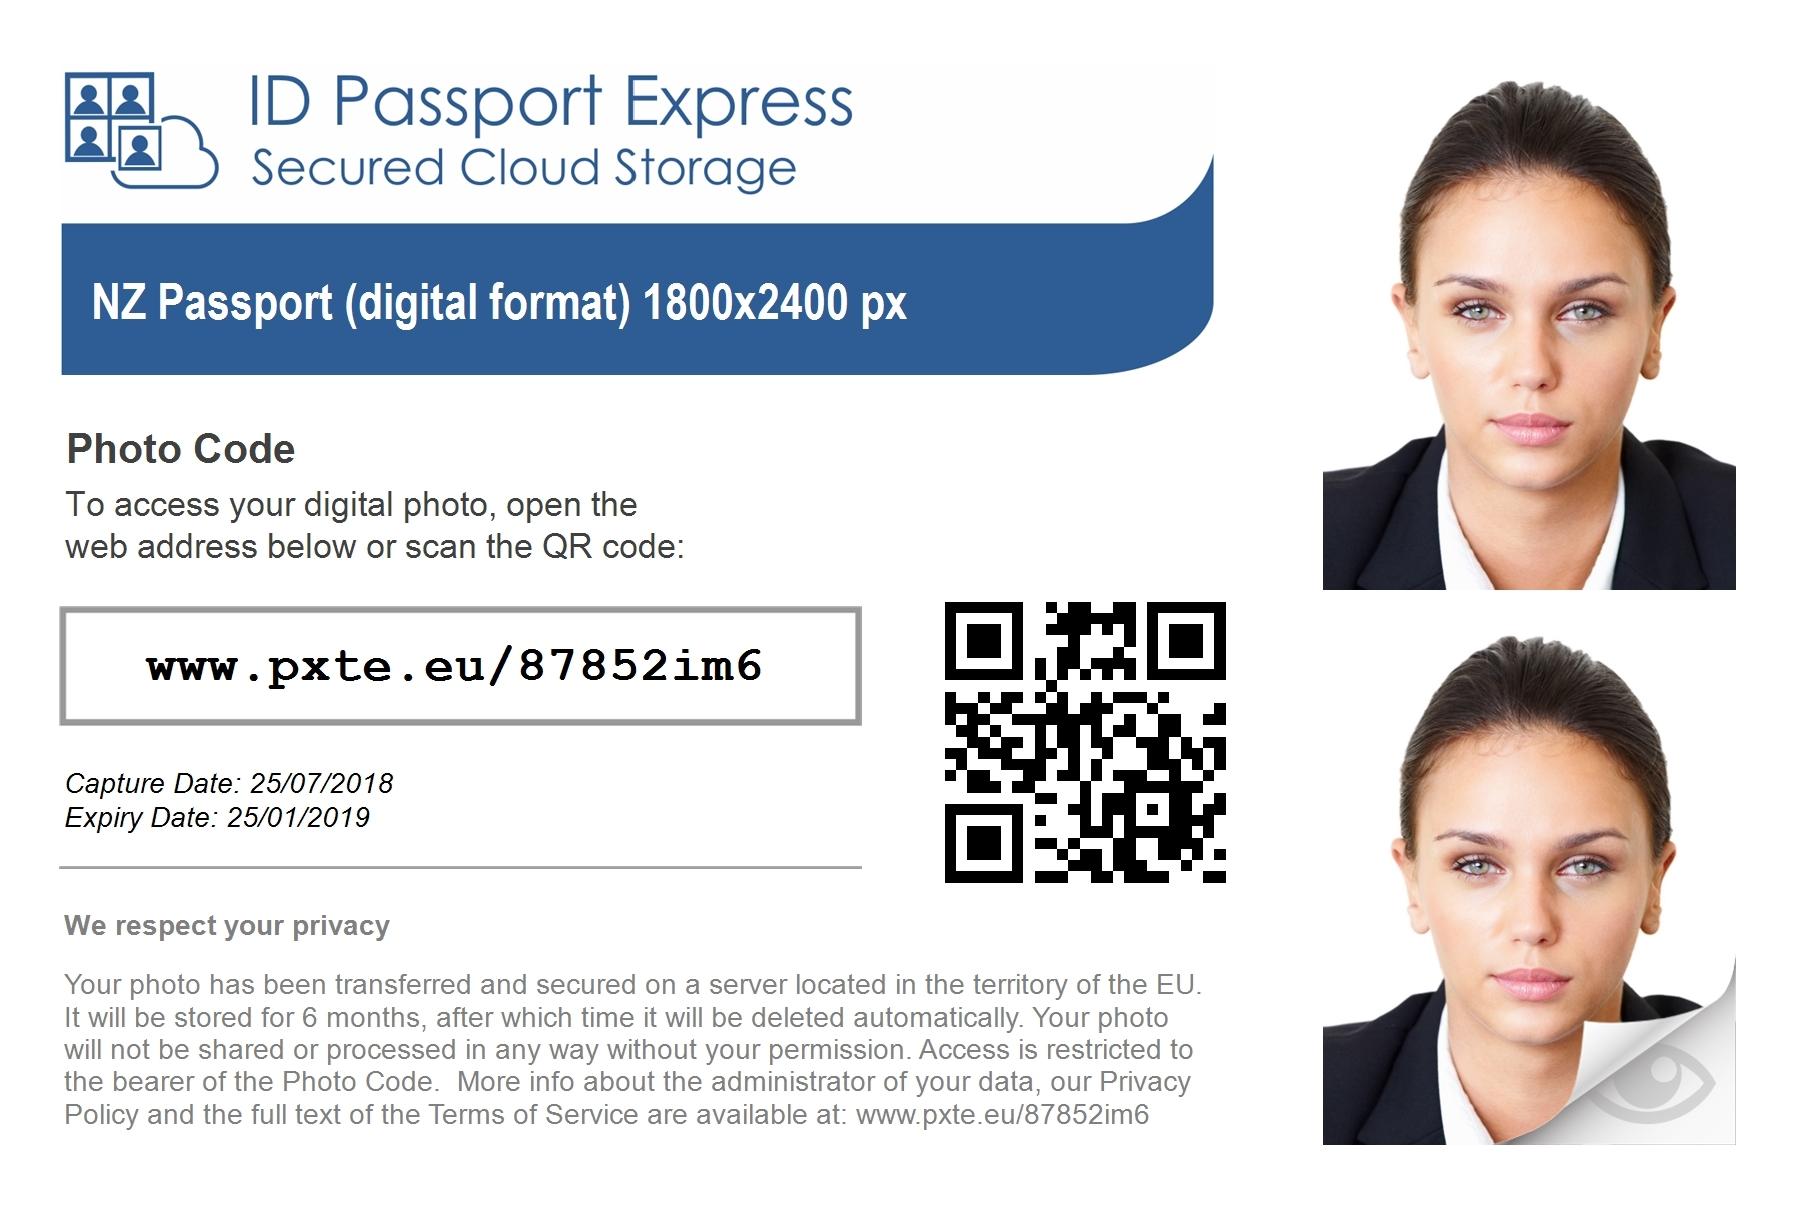 wench1-NZ Passport (digital format)-152x102 mm_SCS 2x preview photo.jpg